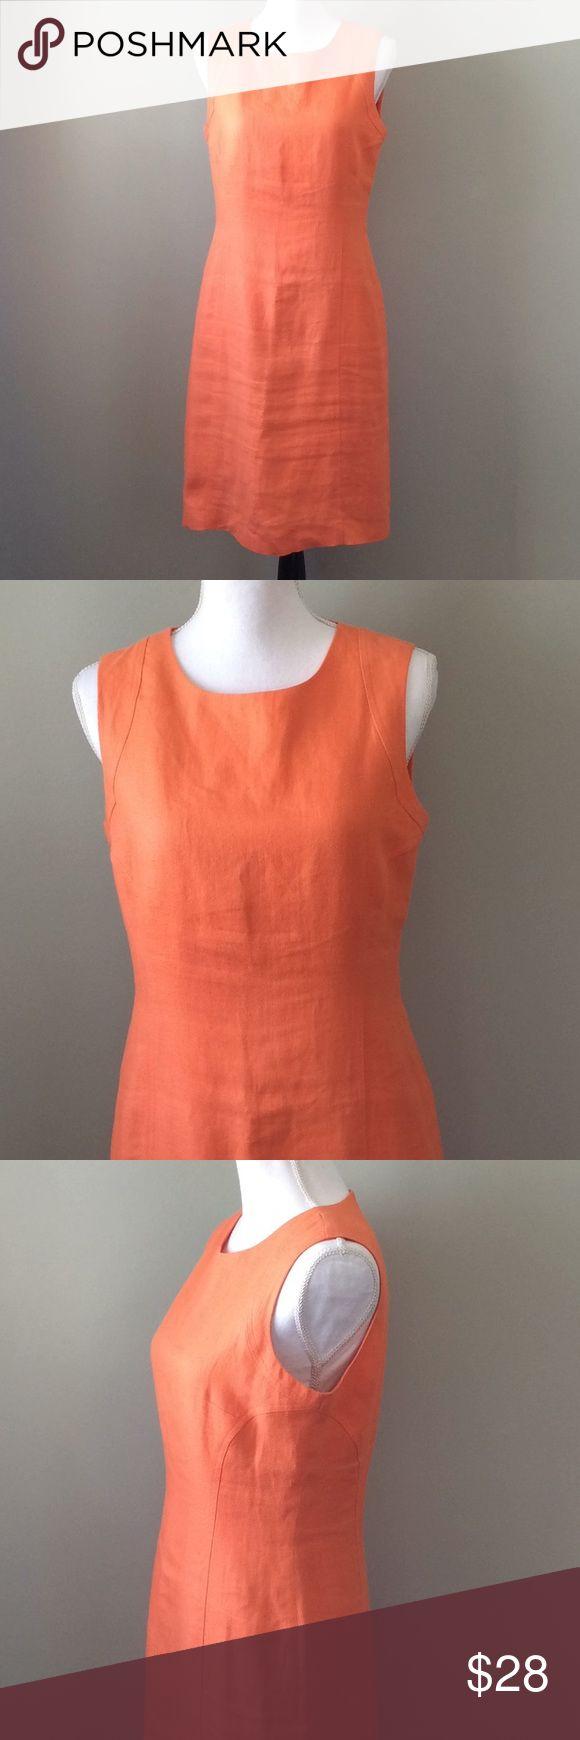 "Talbots Linen Sheath Dress Talbots Women's Sheath Dress Size 8 Sleeveless Irish Linen Lined Orange Chest-17"" Waist-19"" Length-39 Talbots Dresses Midi"